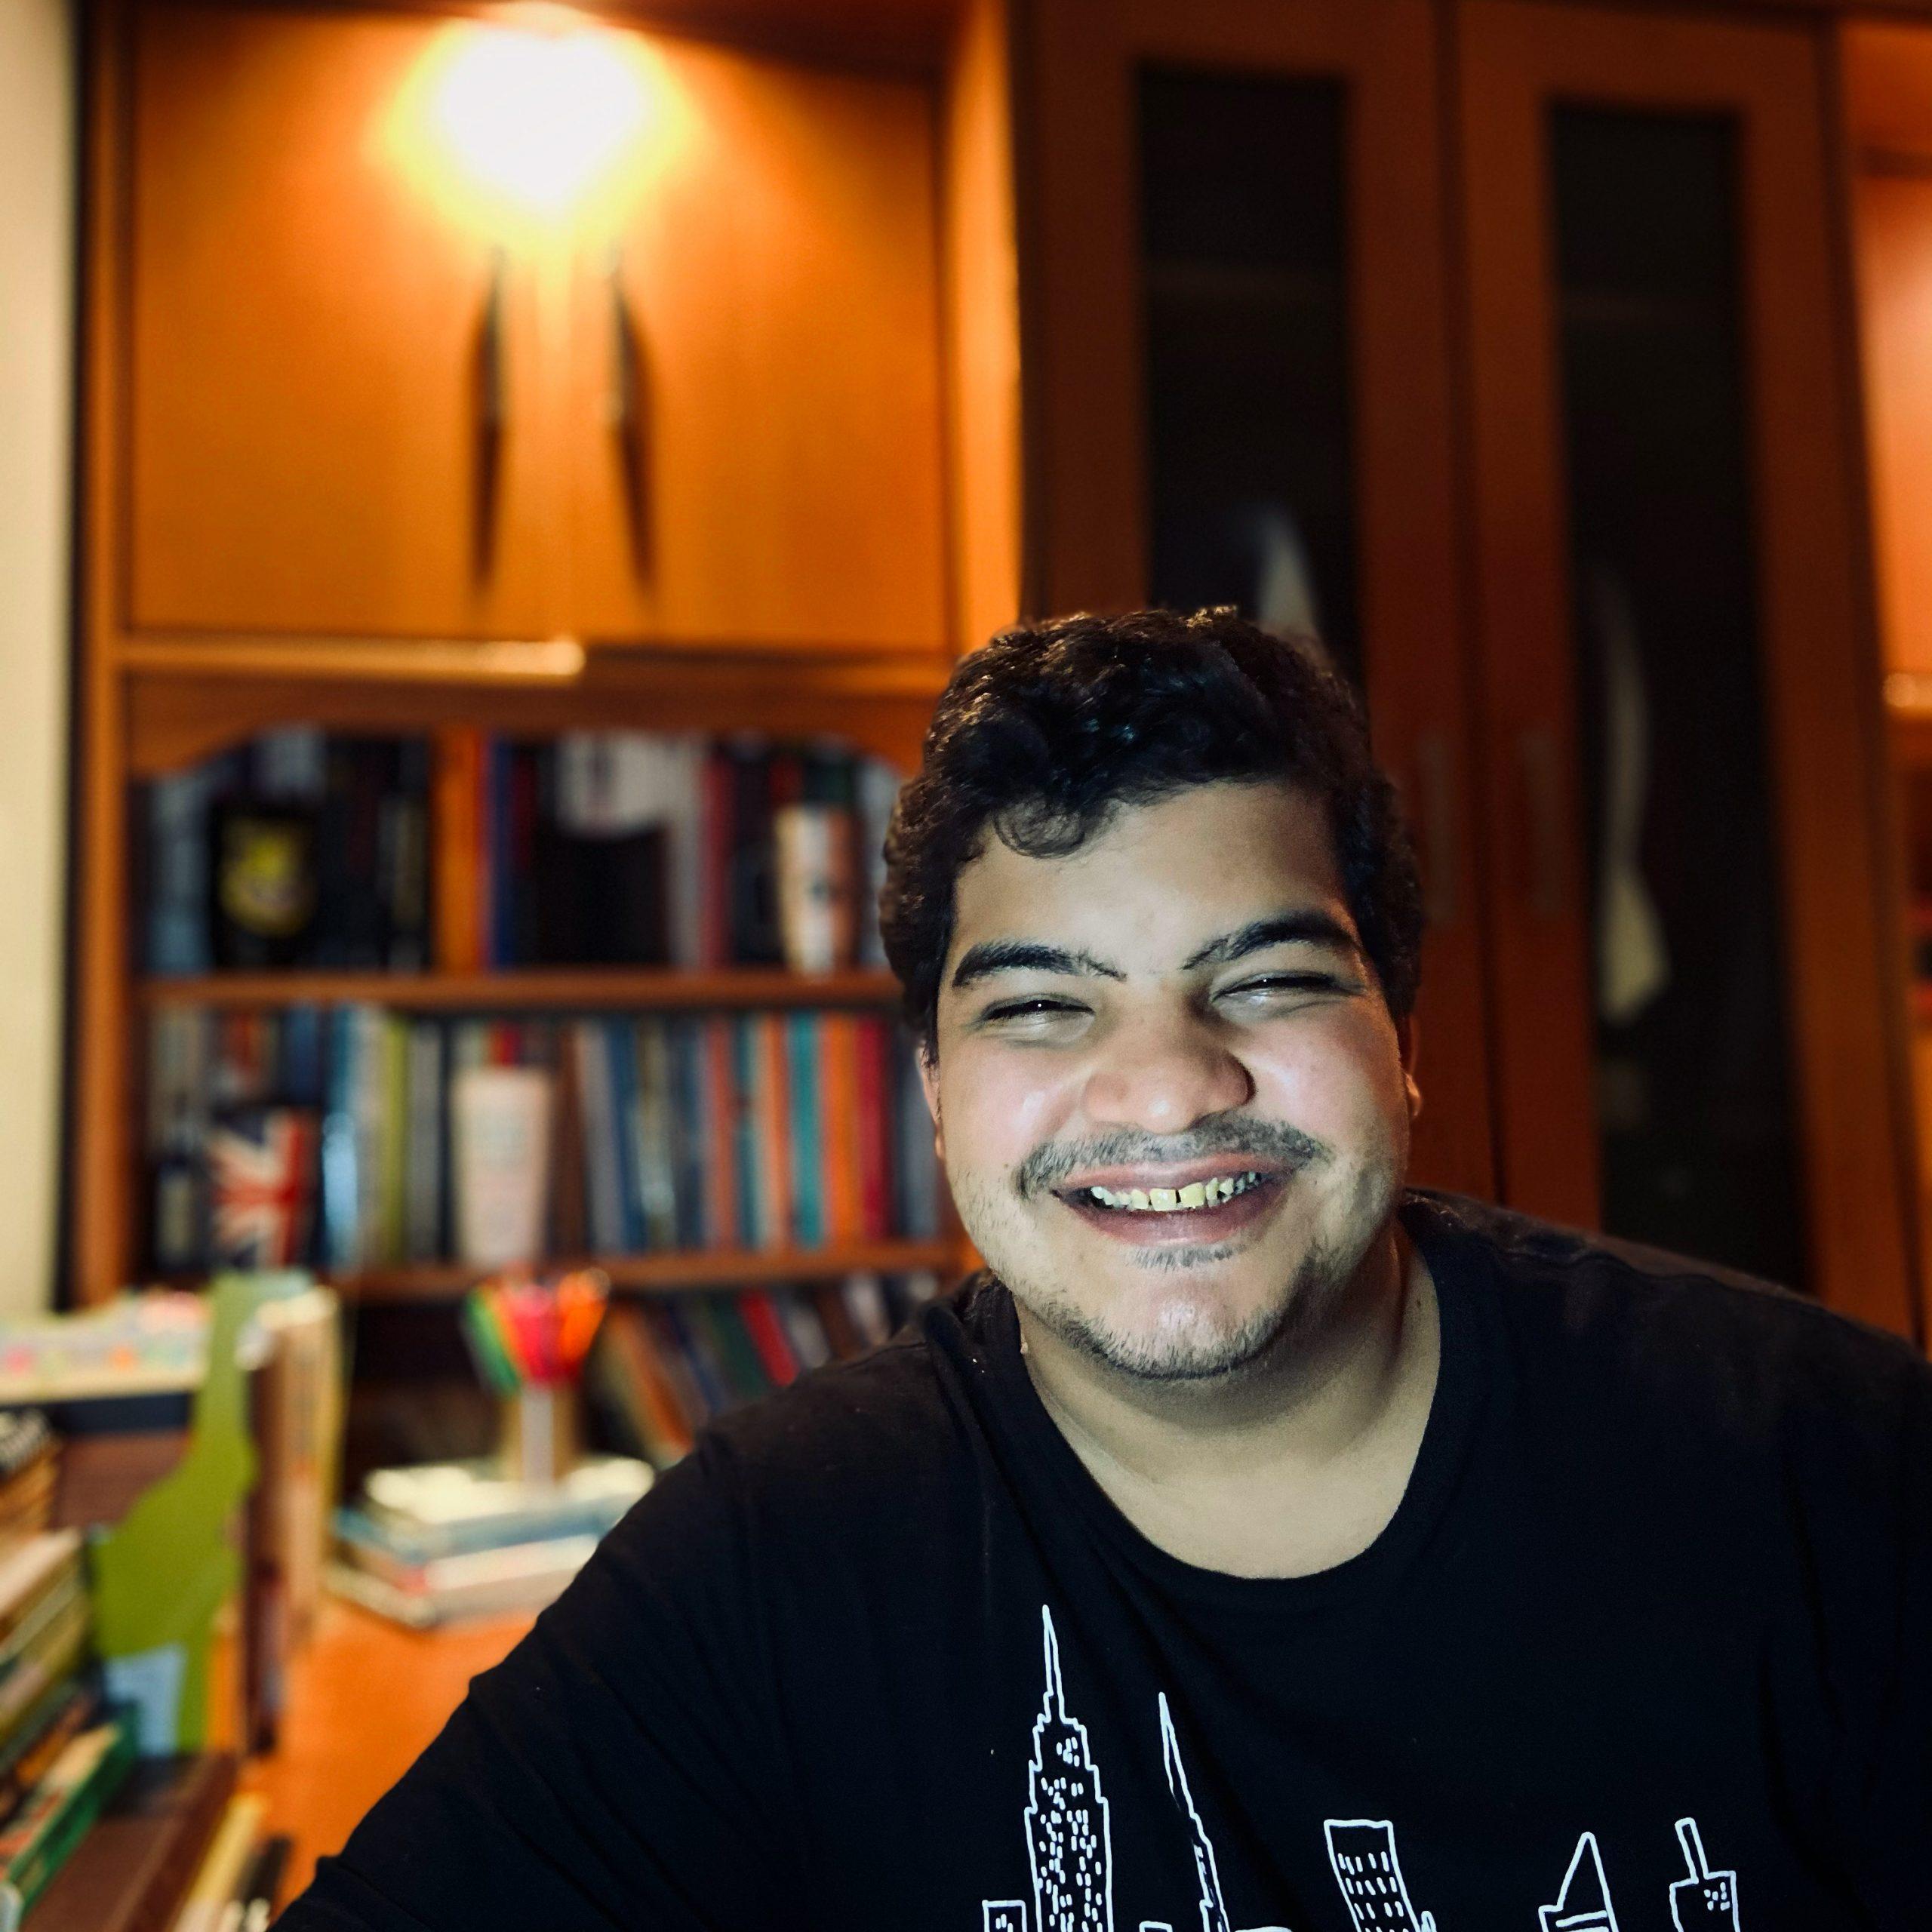 Pedro Paulo Alves